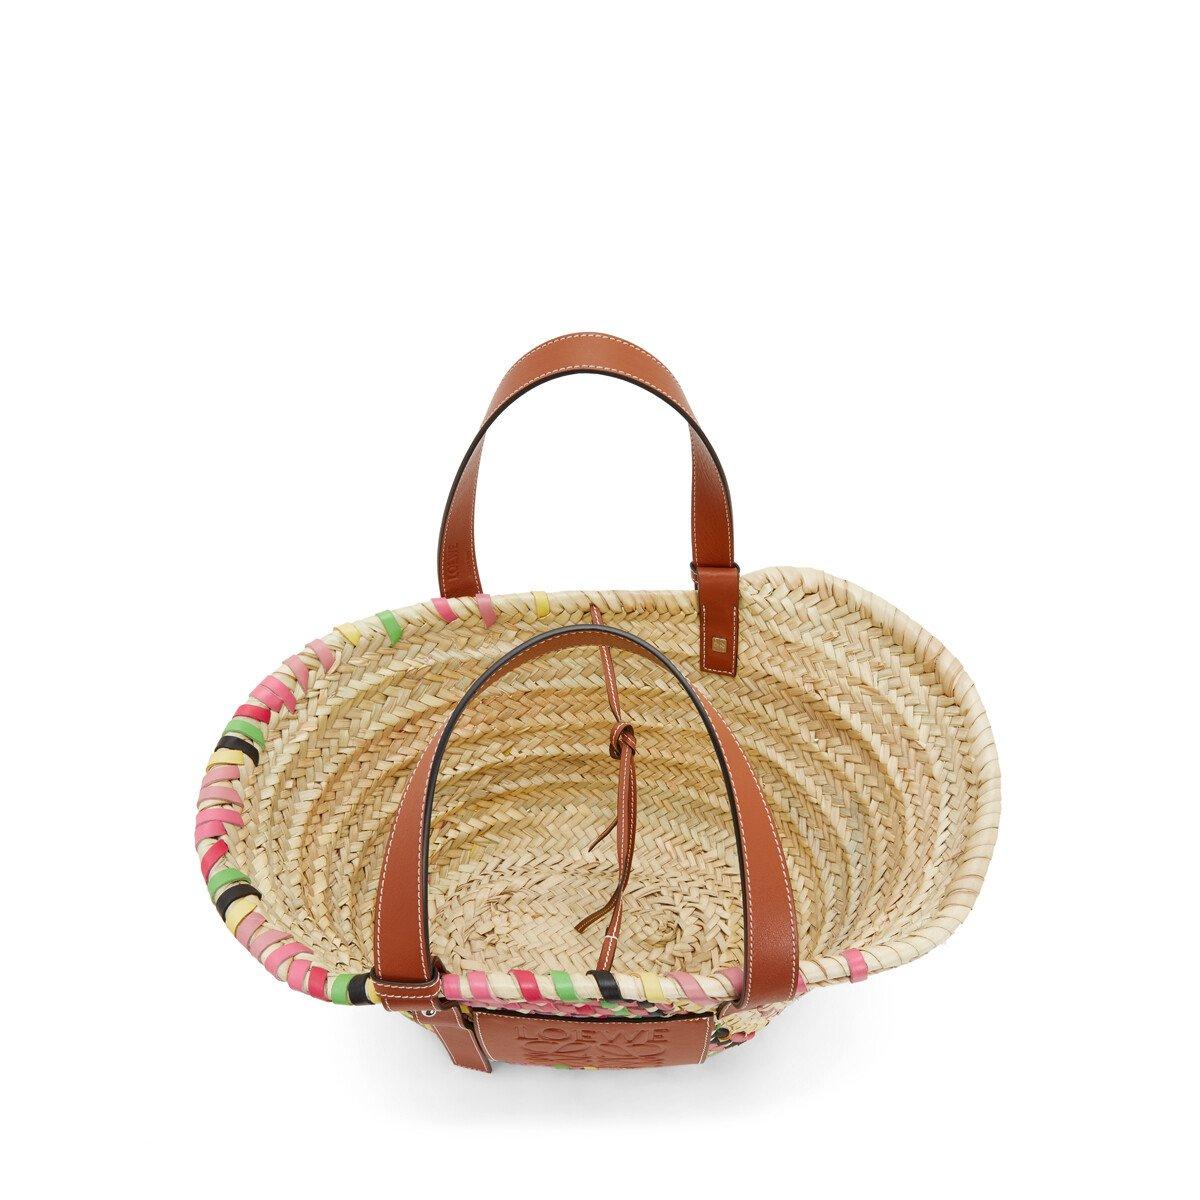 LOEWE バスケットバッグ Pink Multitone/Tan front